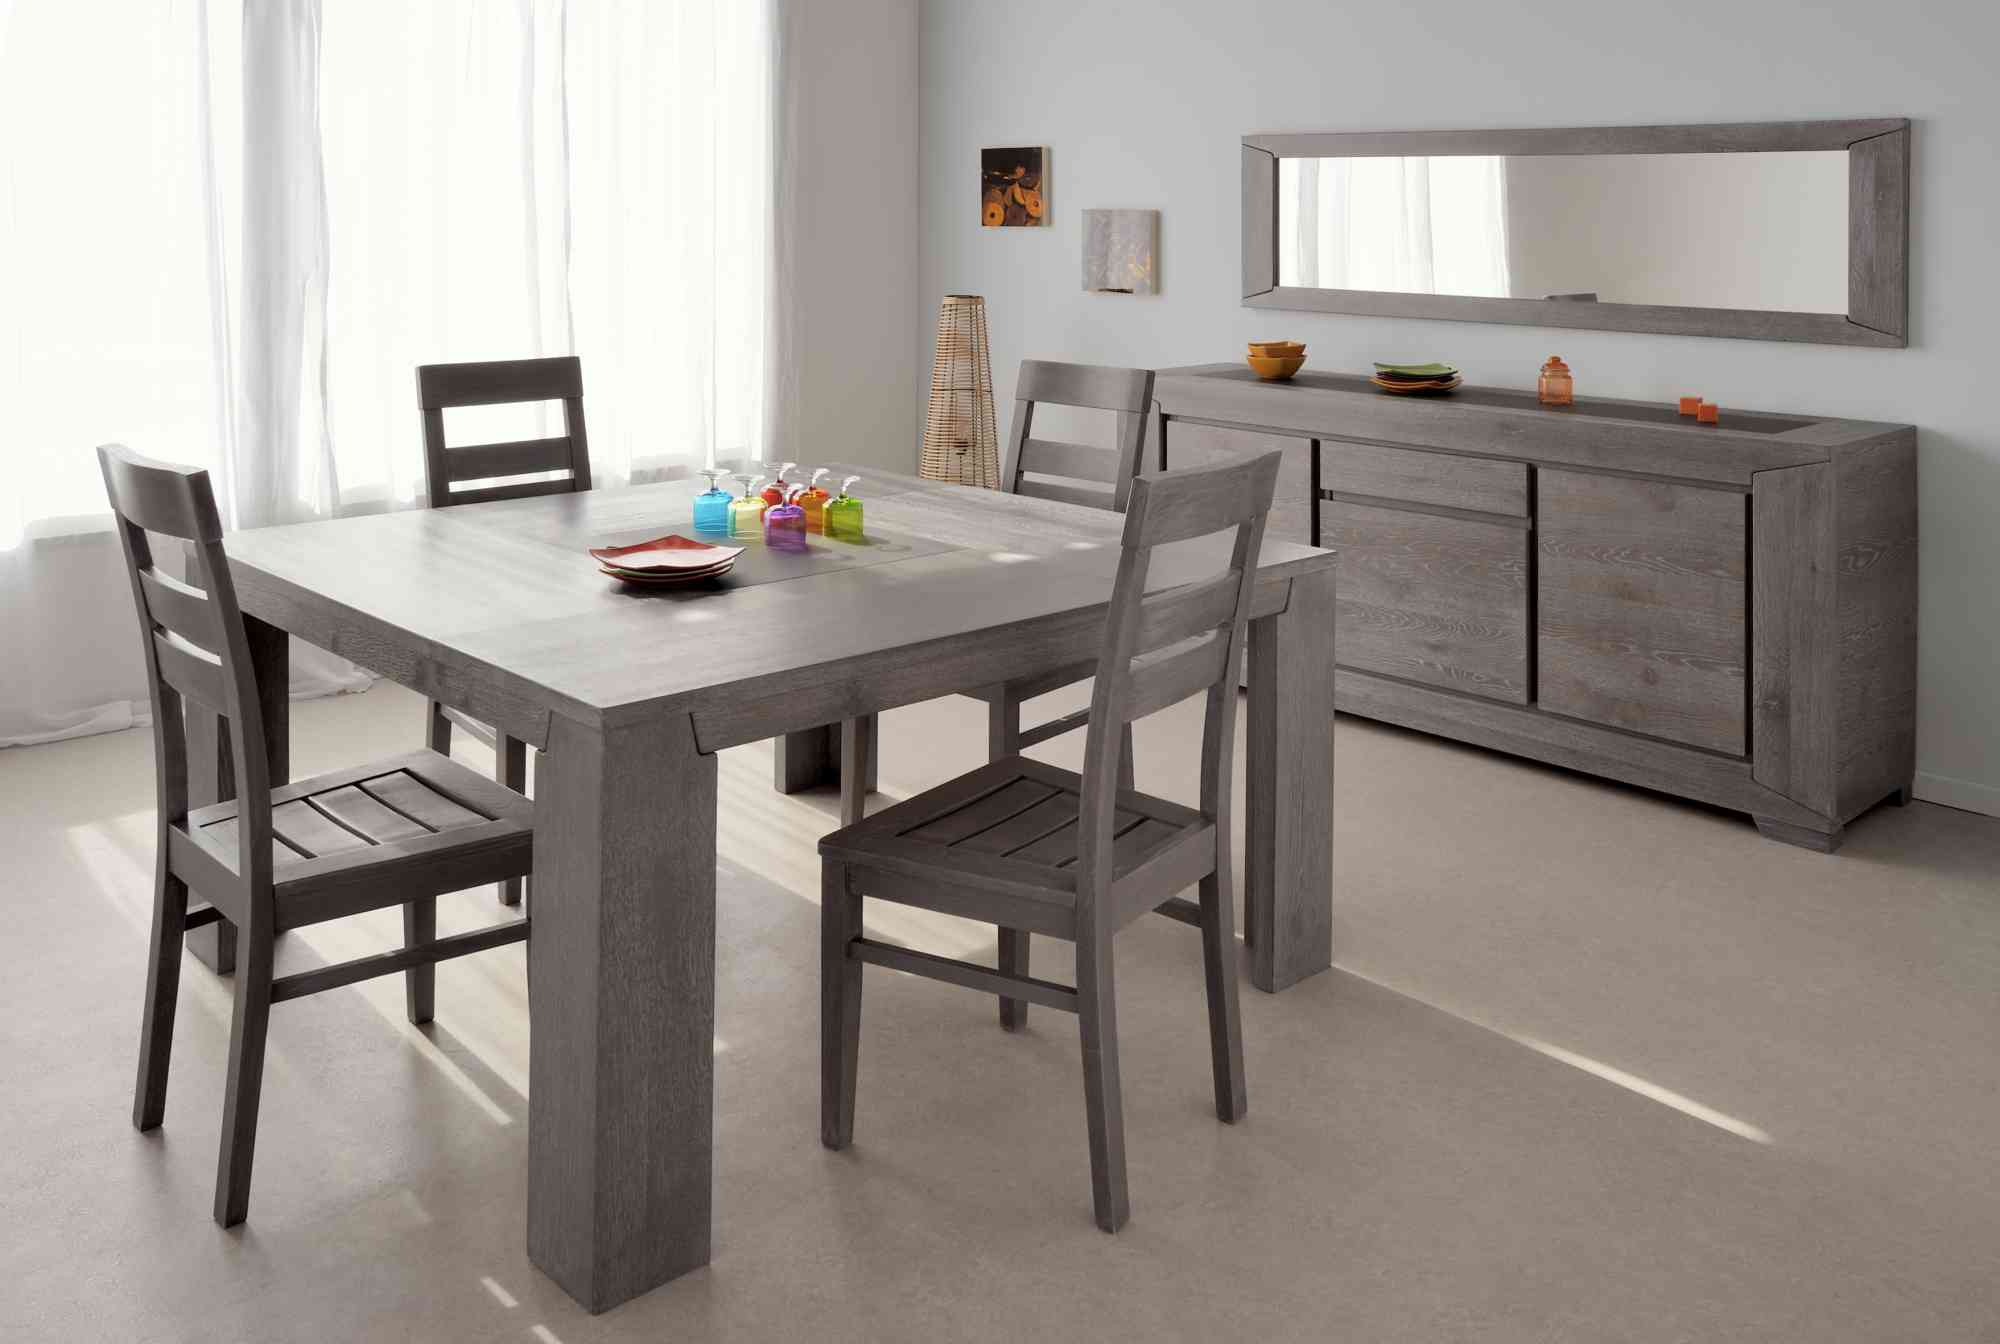 best table de salle a manger but malone allonge de table allo with salle a manger malone but. Black Bedroom Furniture Sets. Home Design Ideas